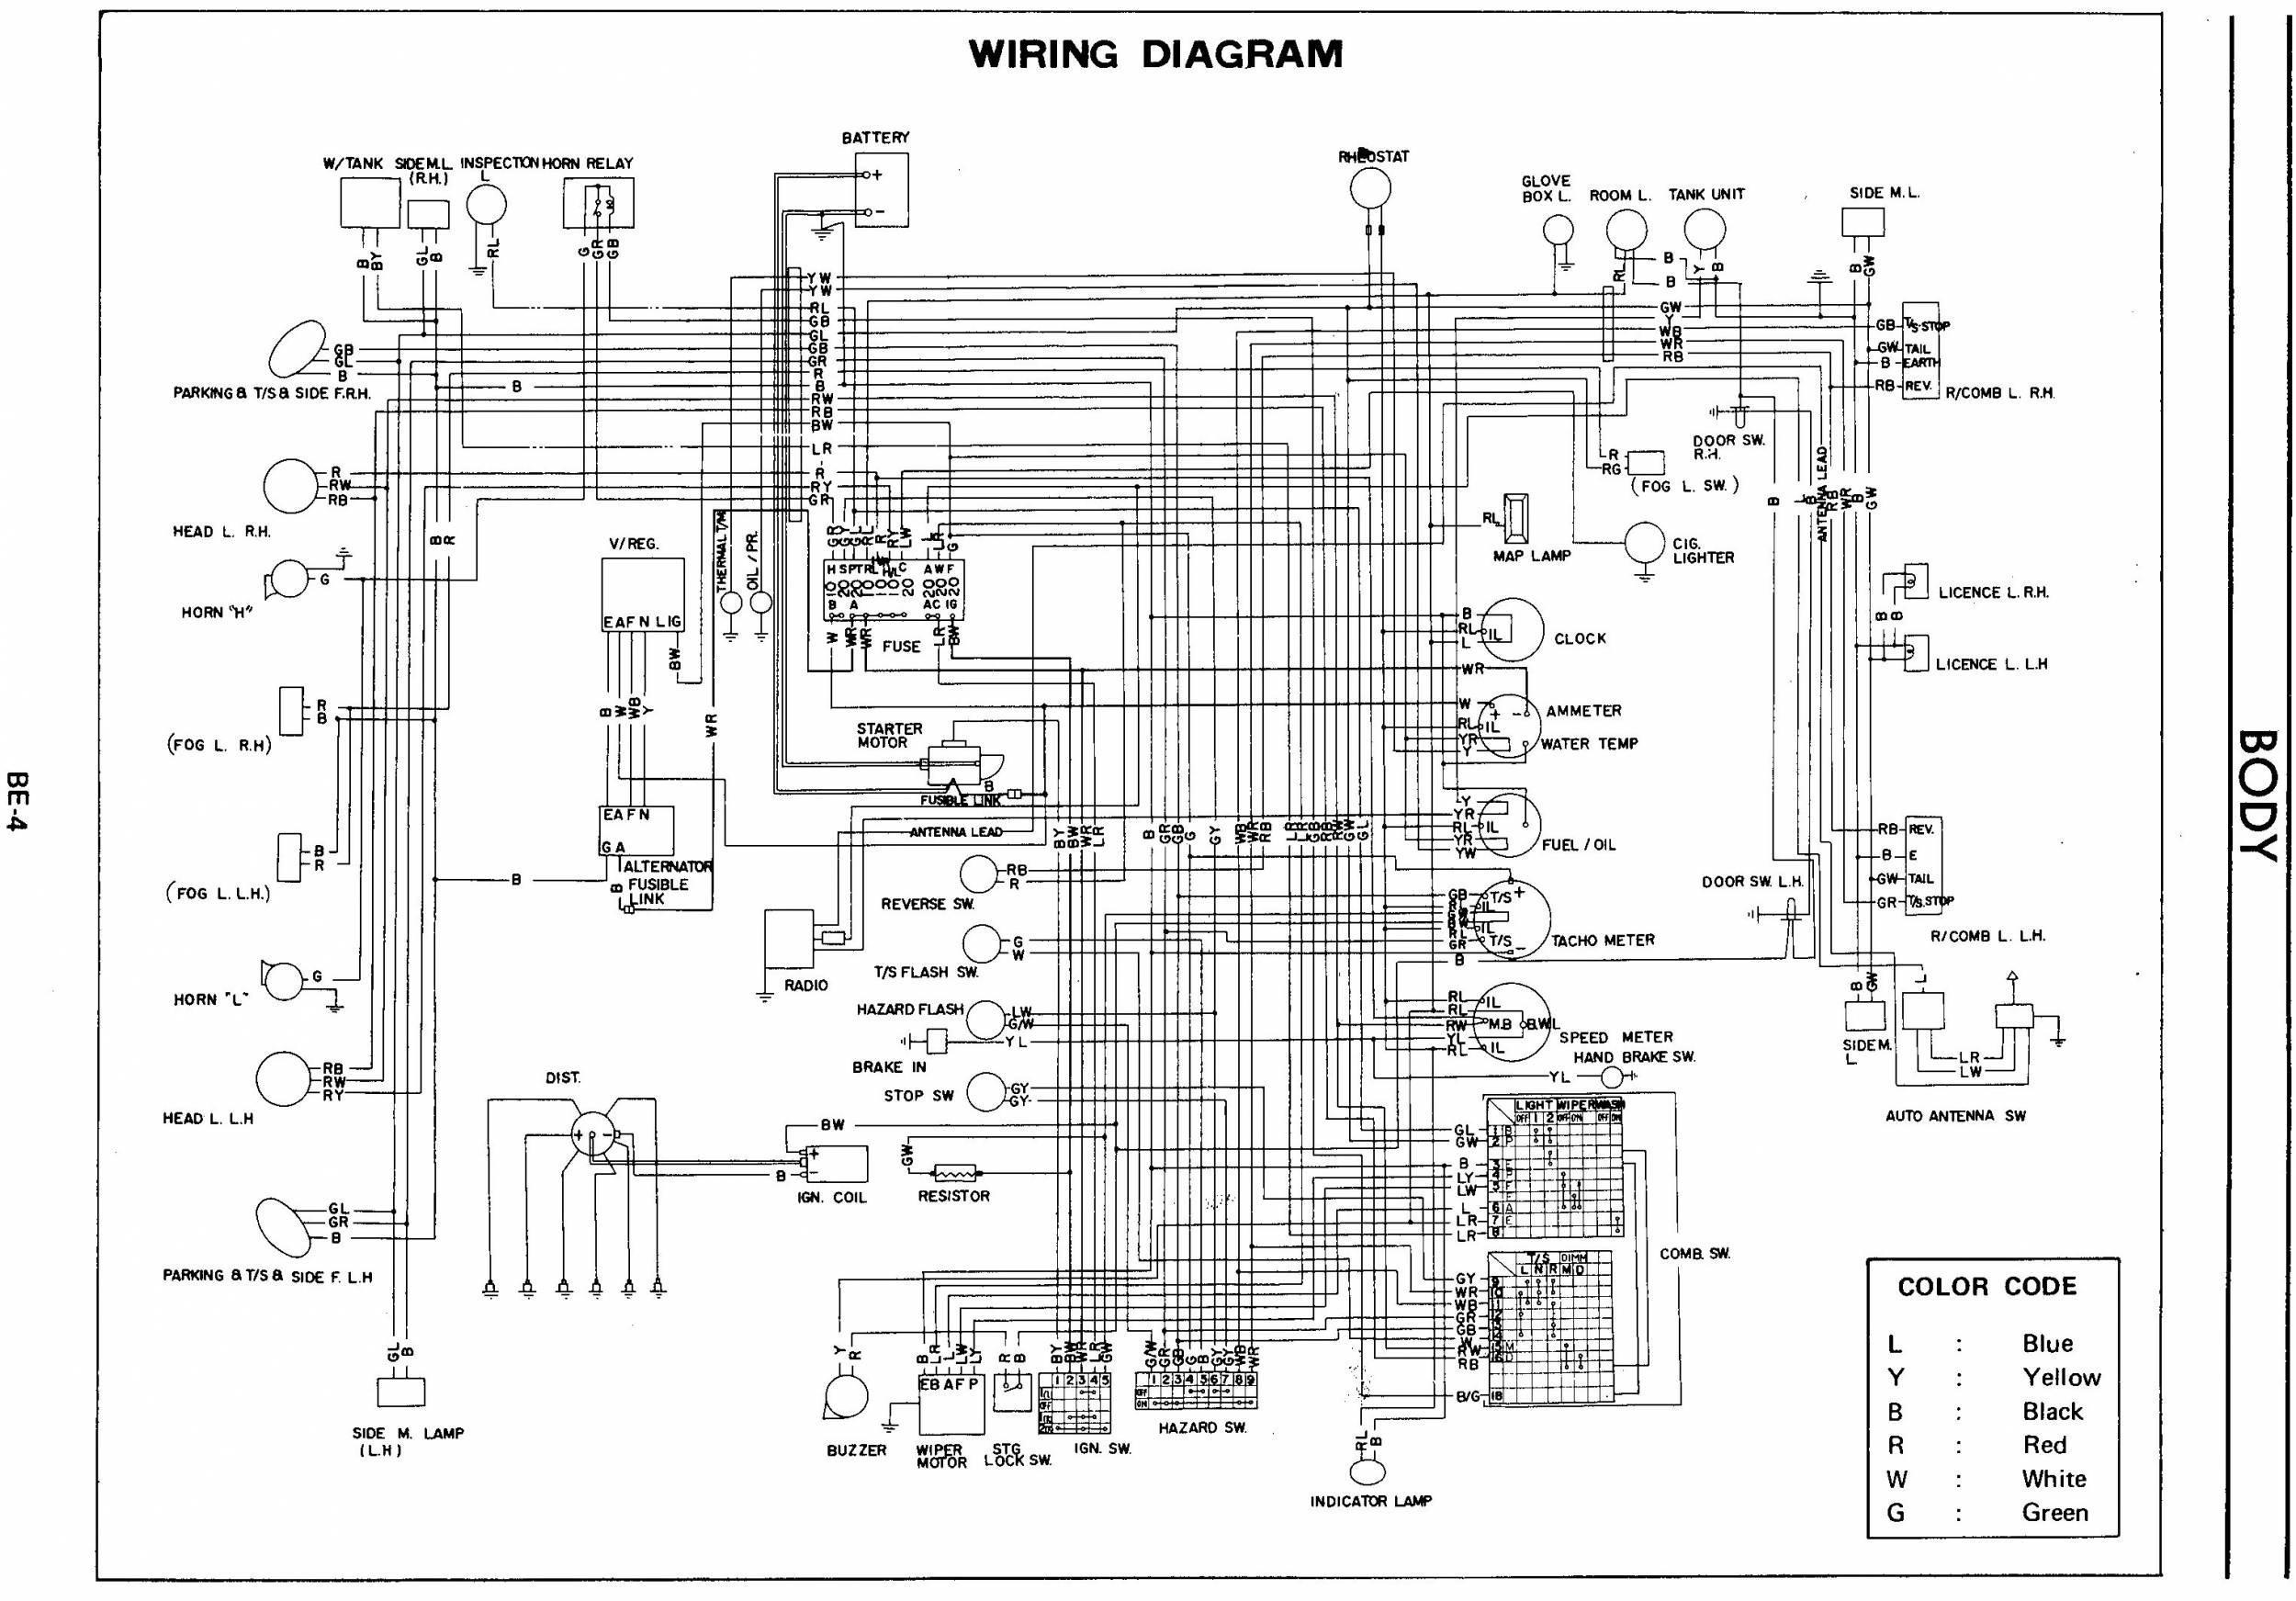 Mini Cooper Engine Bay Diagram 2011 Mini Cooper Fuse Diagram Of Mini Cooper Engine Bay Diagram